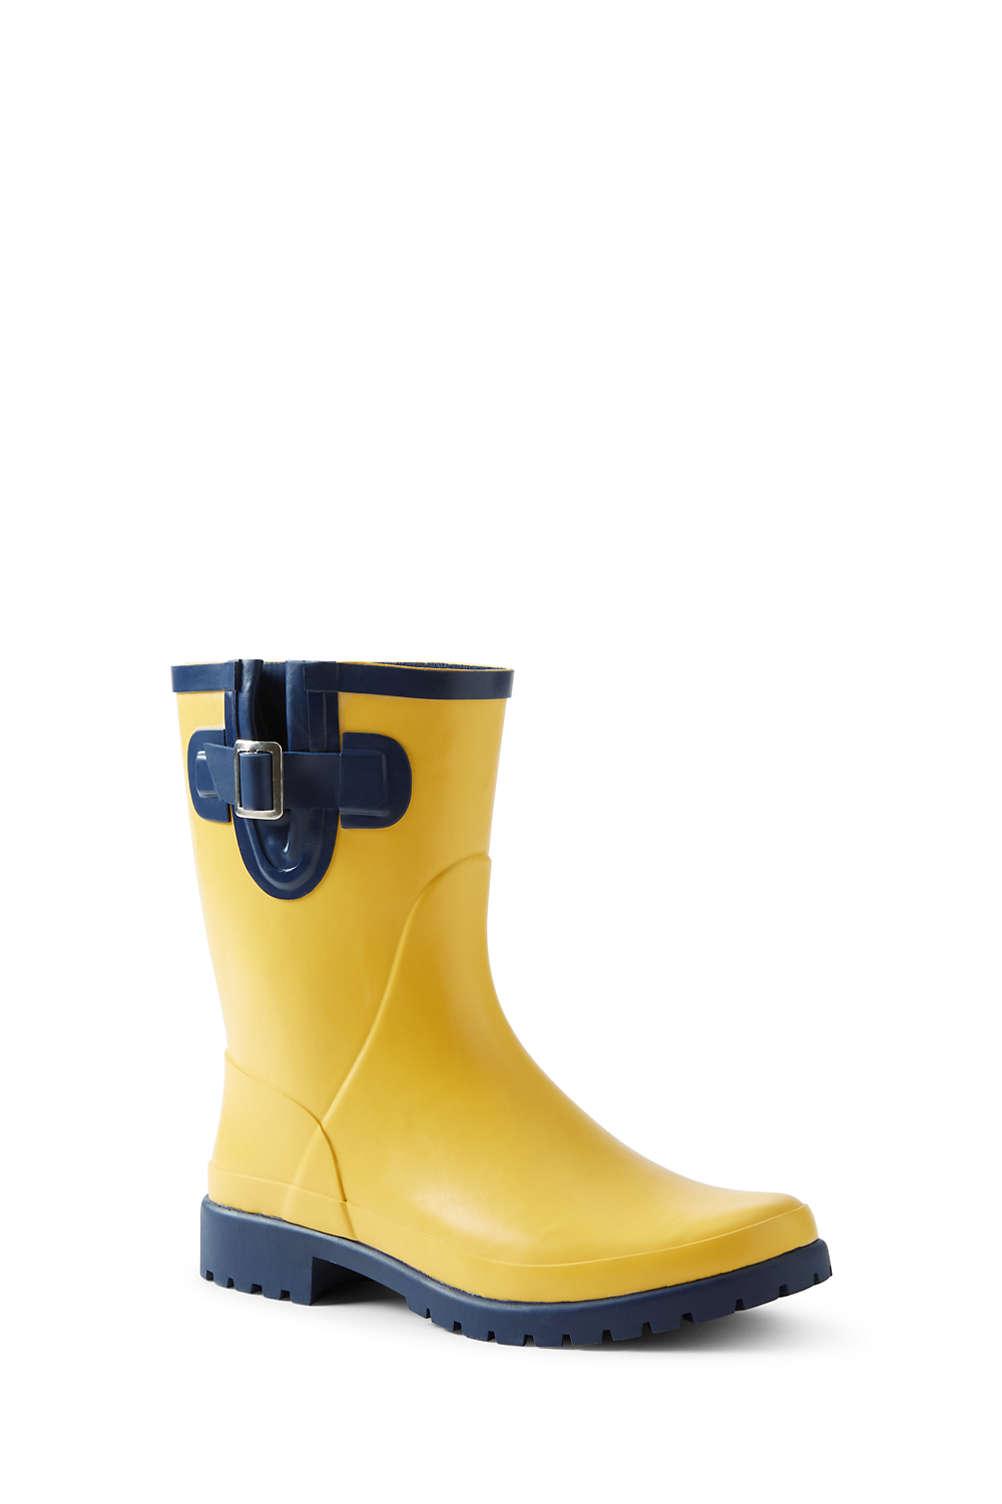 564964dcfa4 Women s Rain Boots from Lands  End